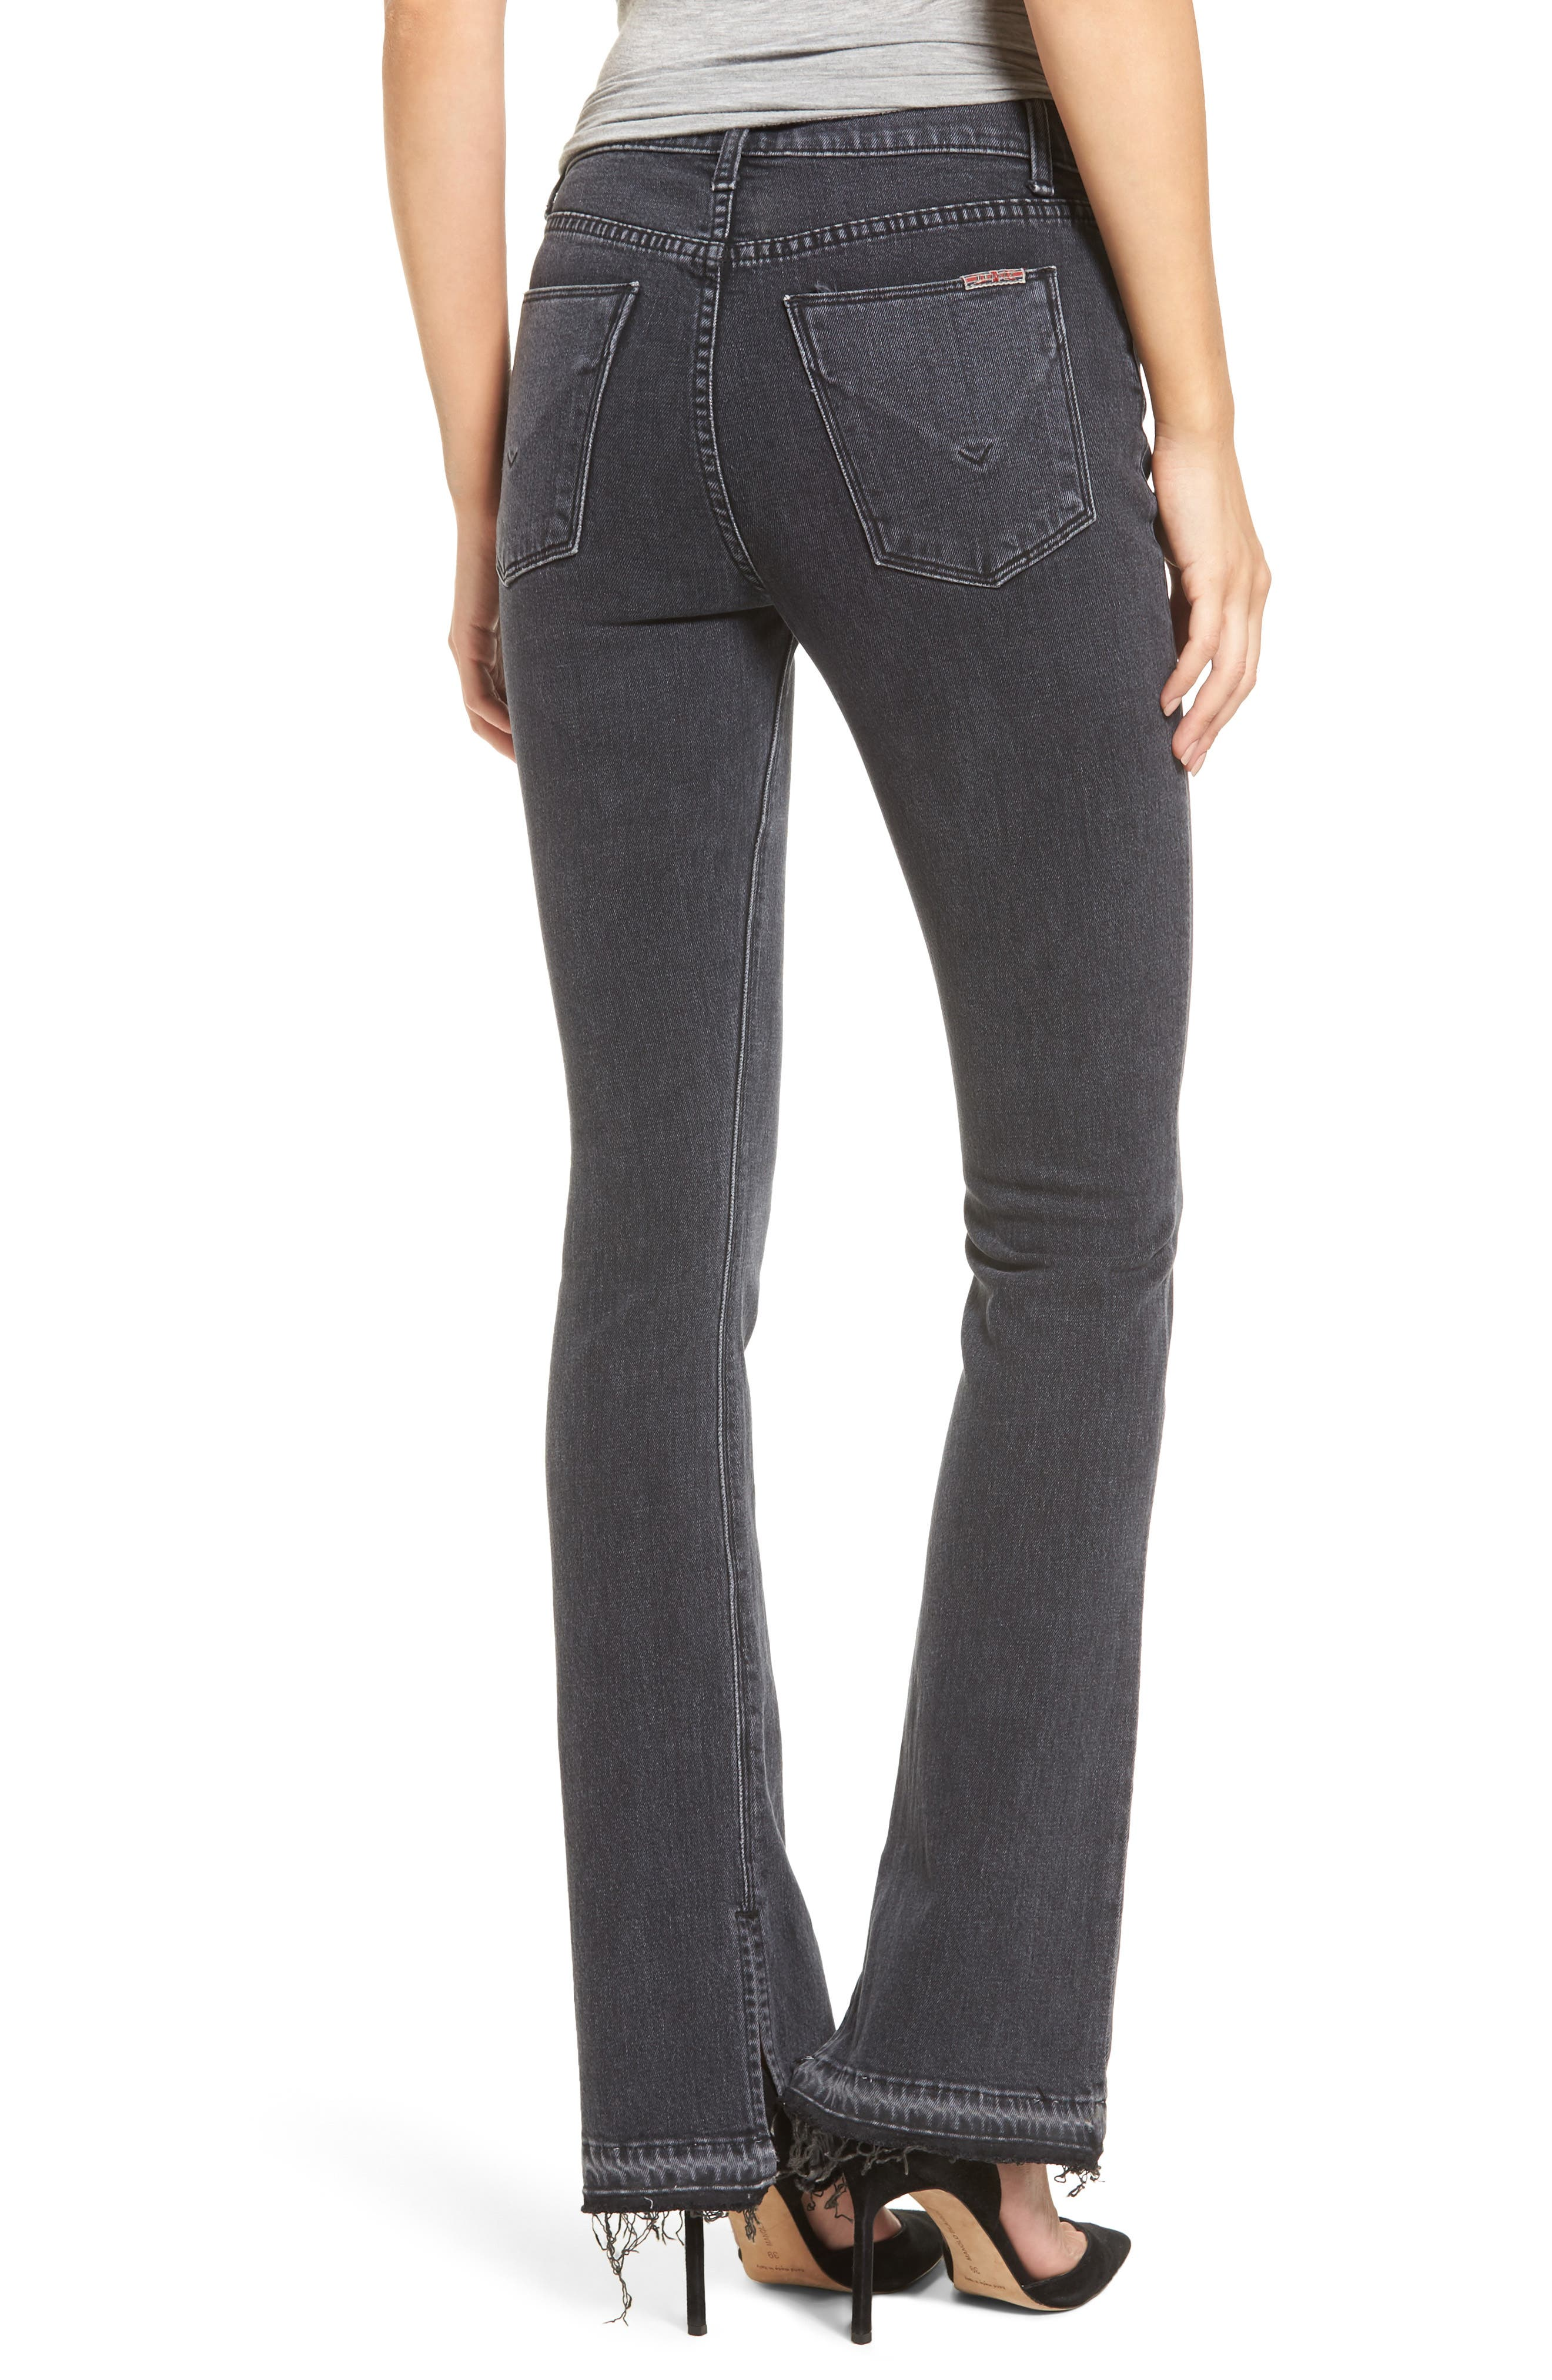 Heartbreaker High Waist Bootcut Jeans,                             Alternate thumbnail 2, color,                             001